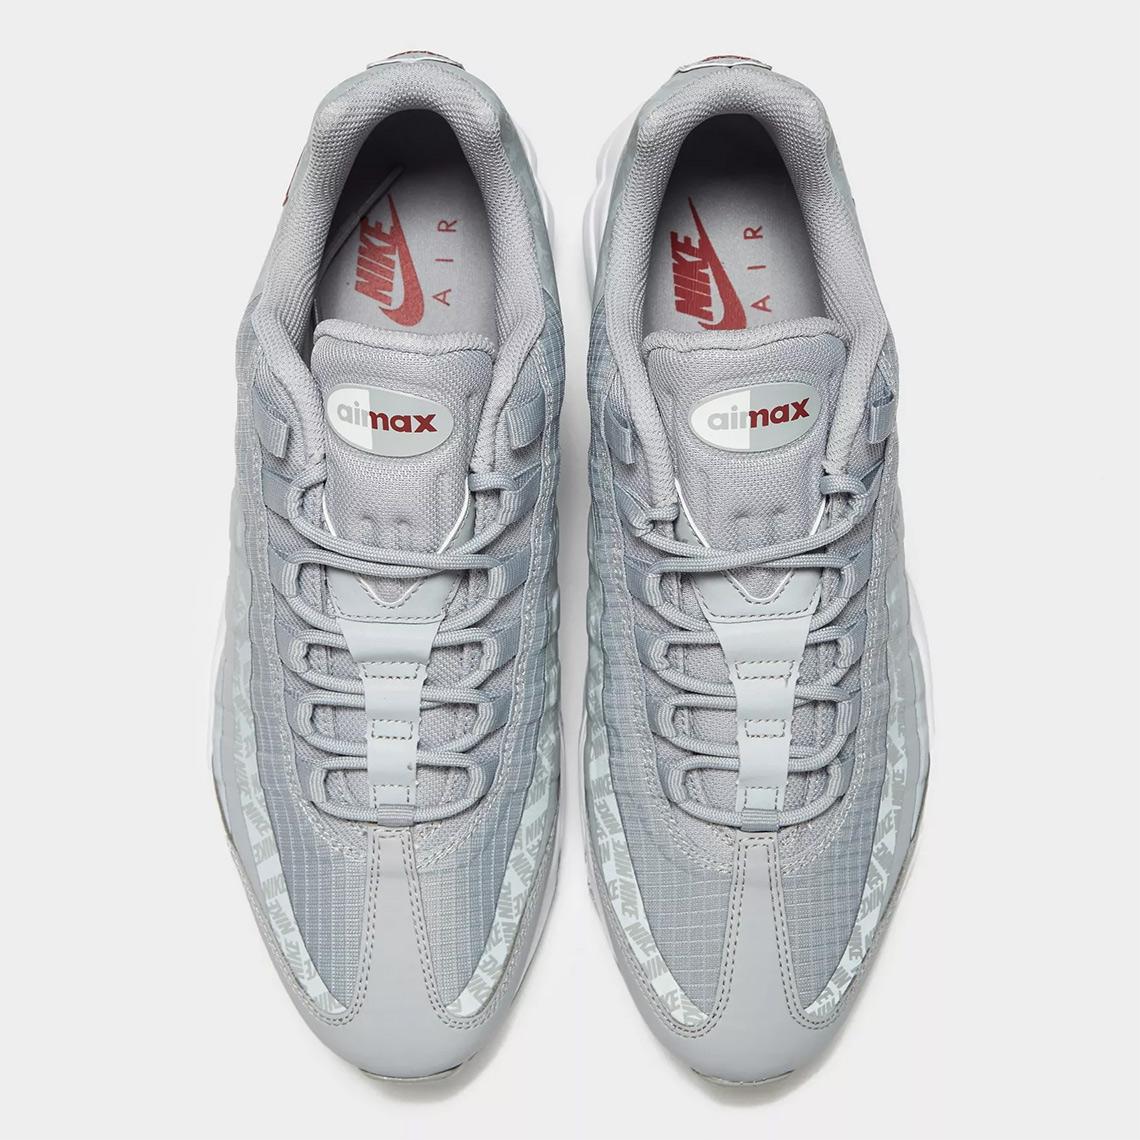 abb1c3bcb08a36 Nike Air Max 95 Ultra SE Release Date  September